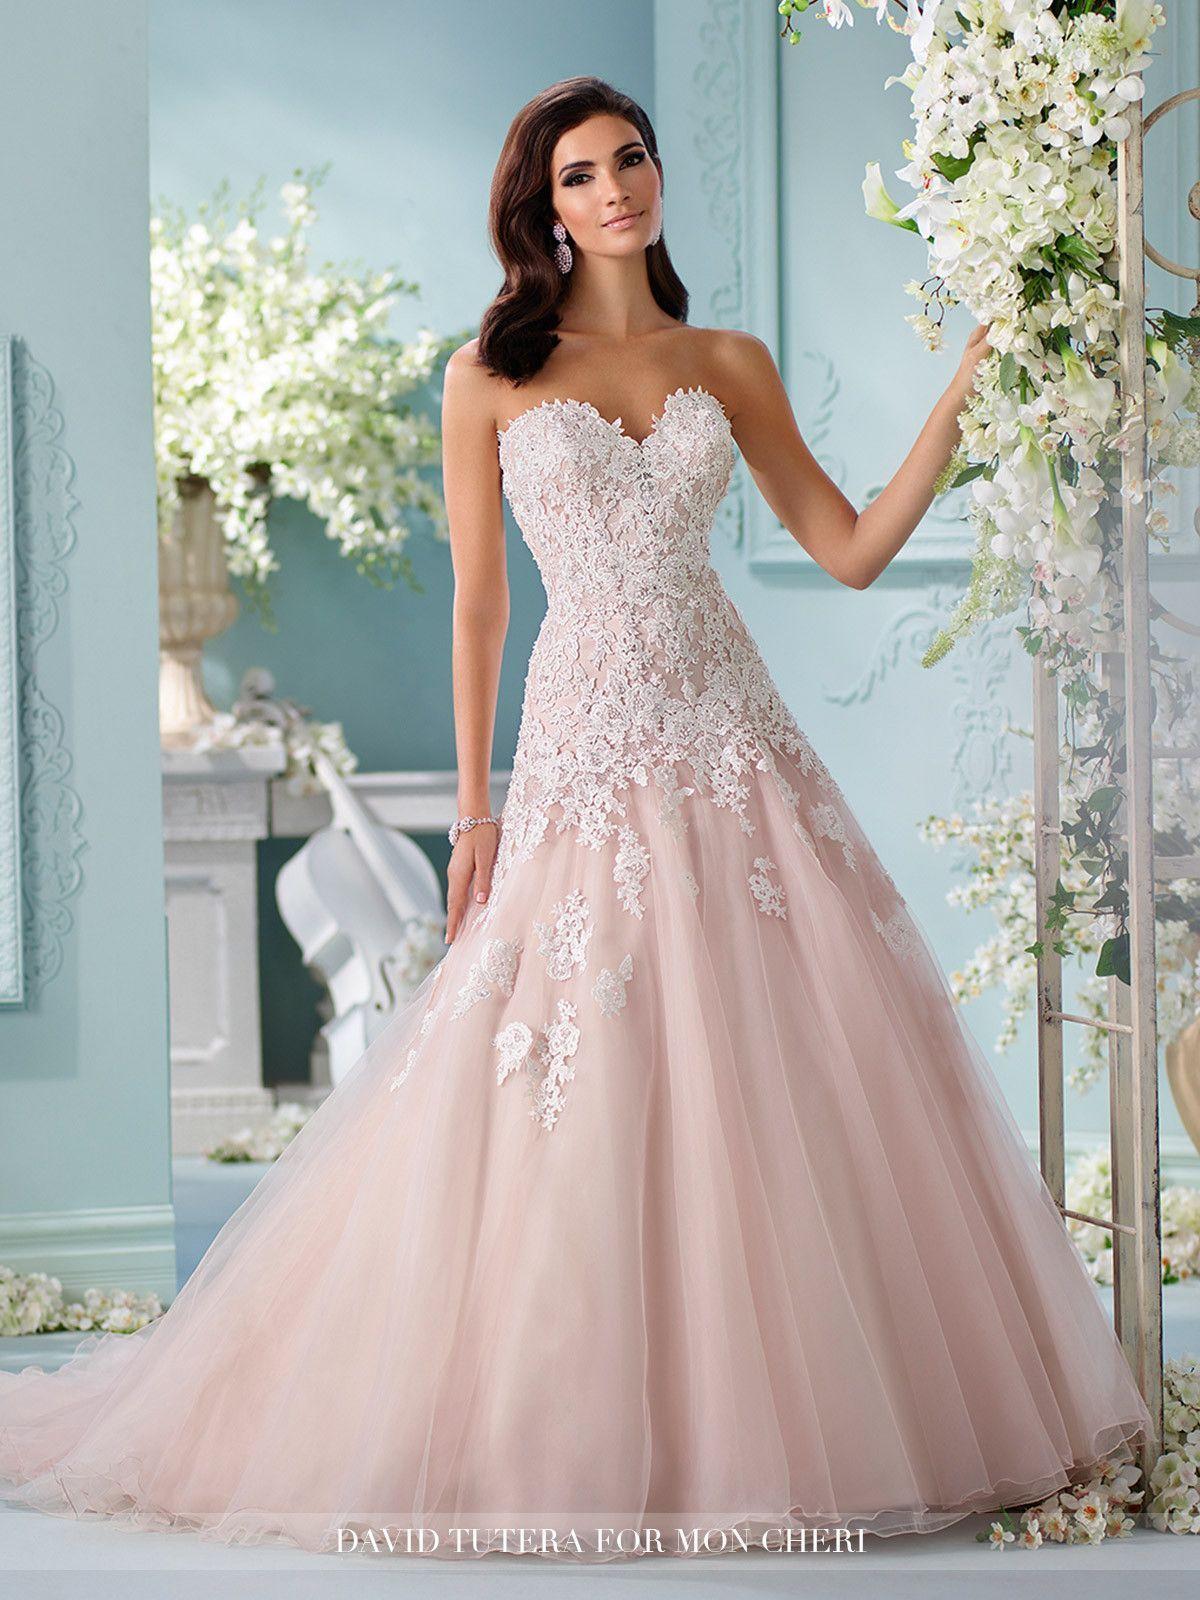 David Tutera Kalapini 216241 All Dressed Up Bridal Gown Wedding Dresses Sweetheart Wedding Dress Aline Wedding Dress